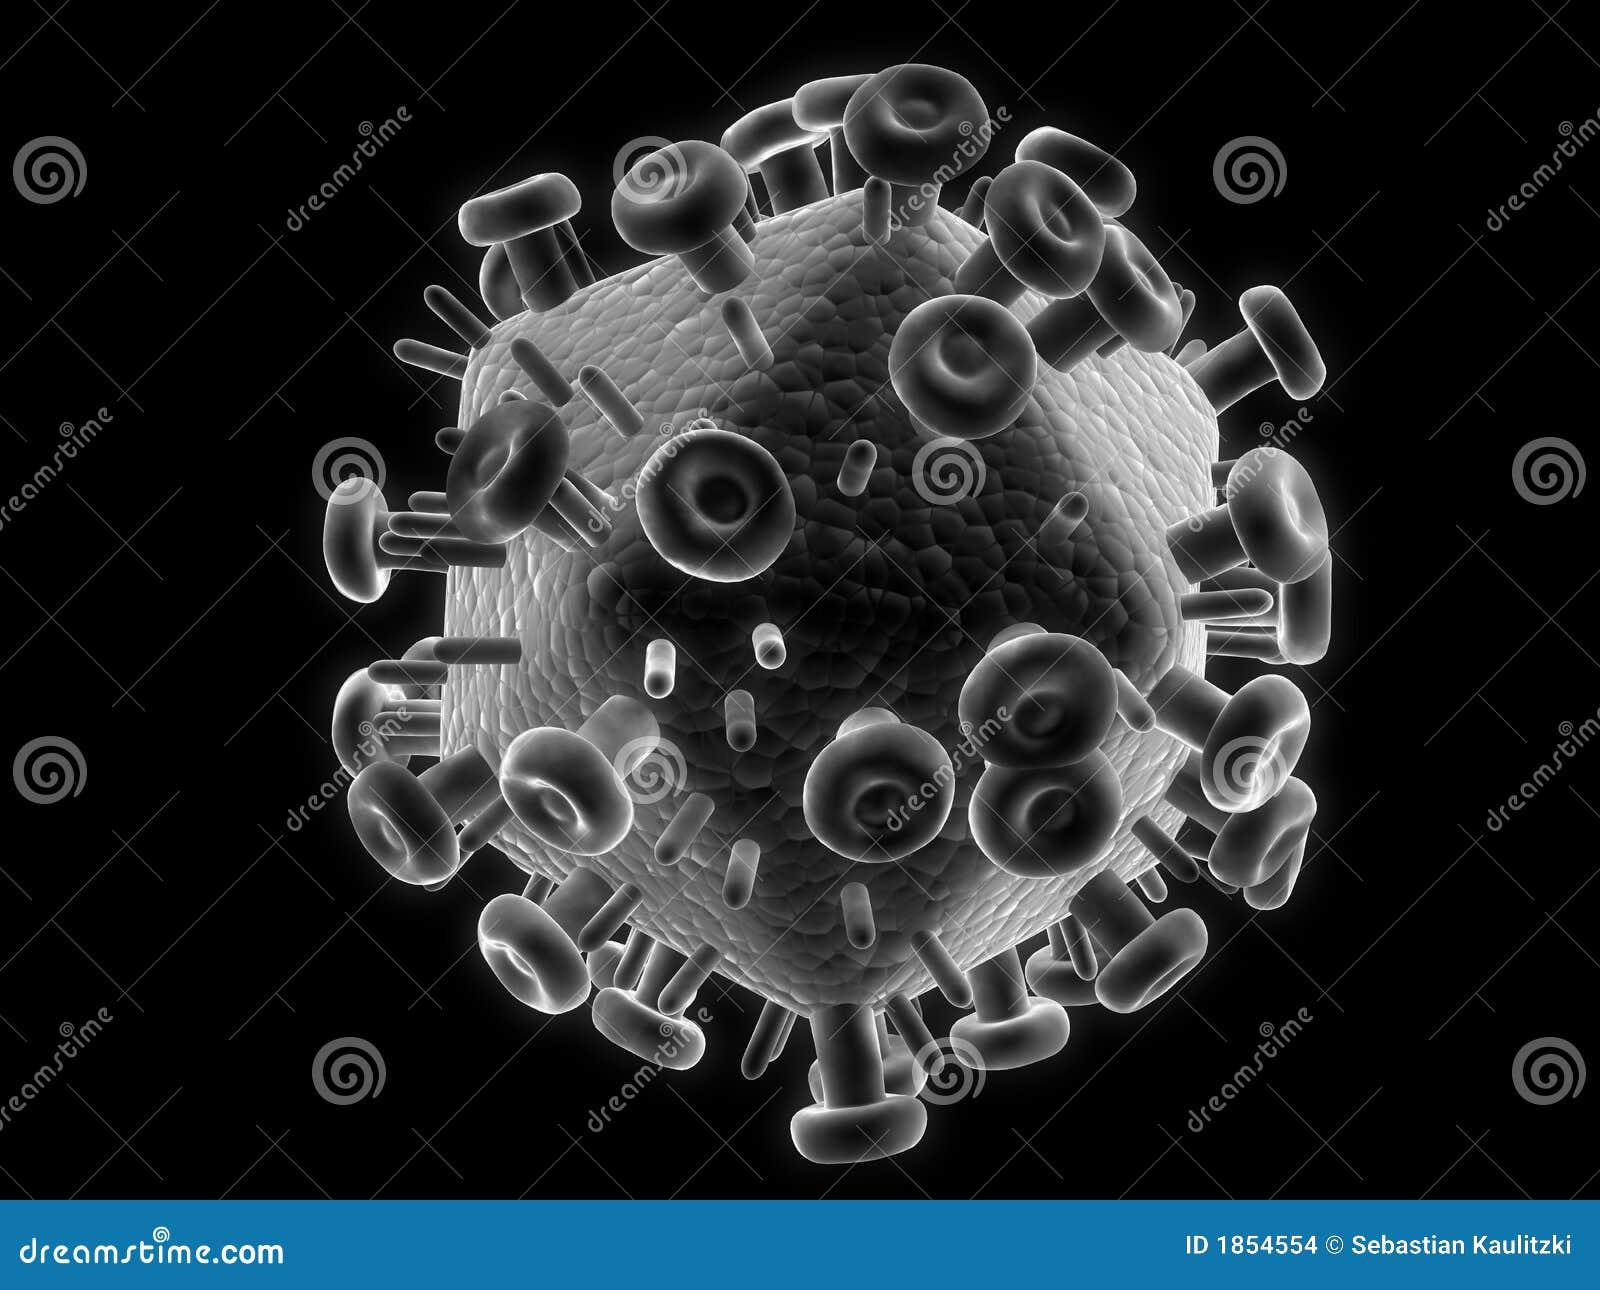 hiv virus stock illustration image of macro drug clinic 1854554. Black Bedroom Furniture Sets. Home Design Ideas